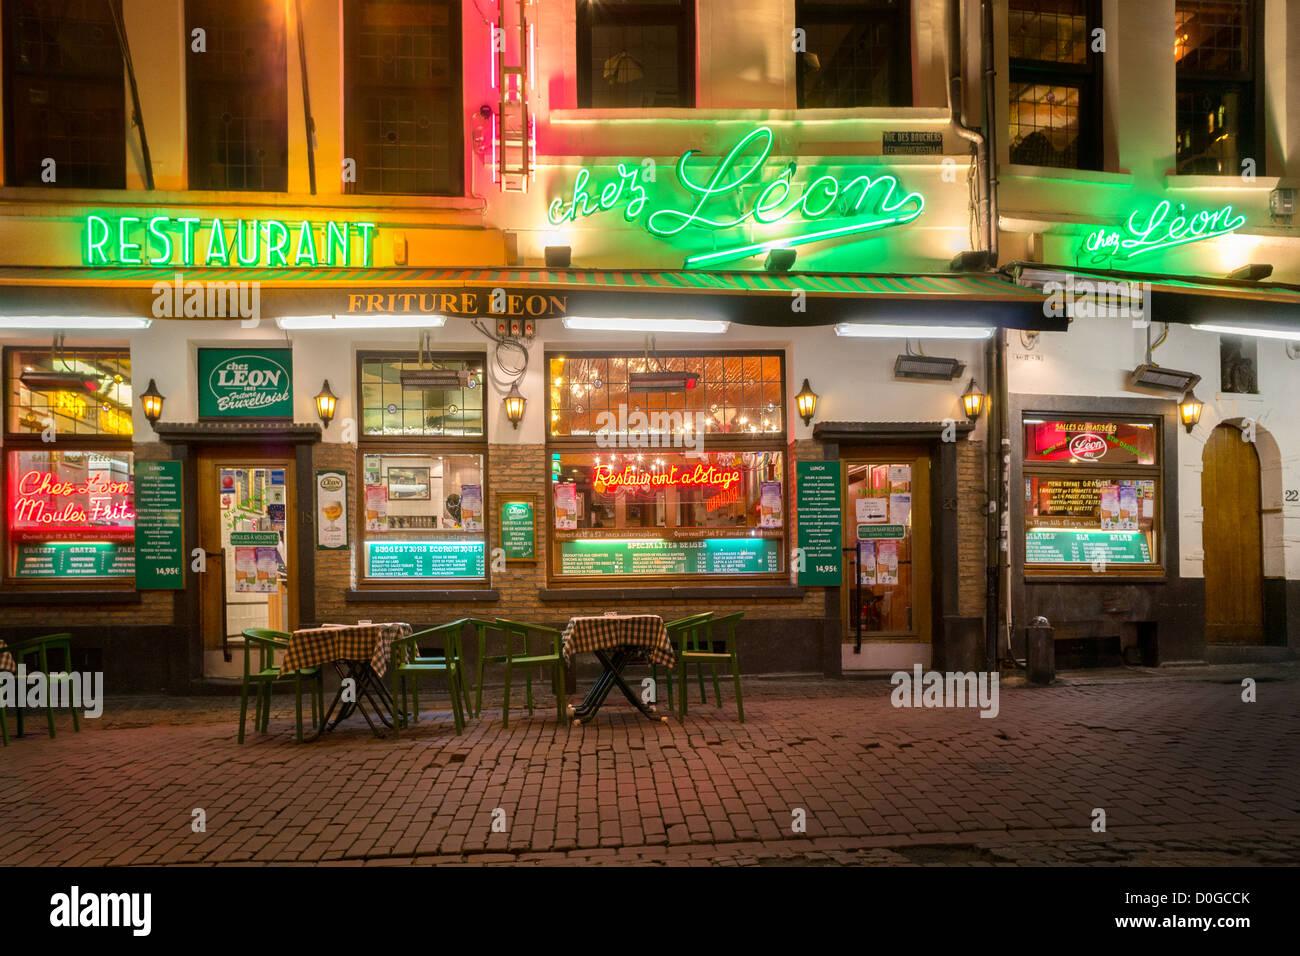 Famous Belgian mussels and chips restaurant Chez Léon, Leon, Rue des Bouchers Brussels. Traditional friture - Stock Image